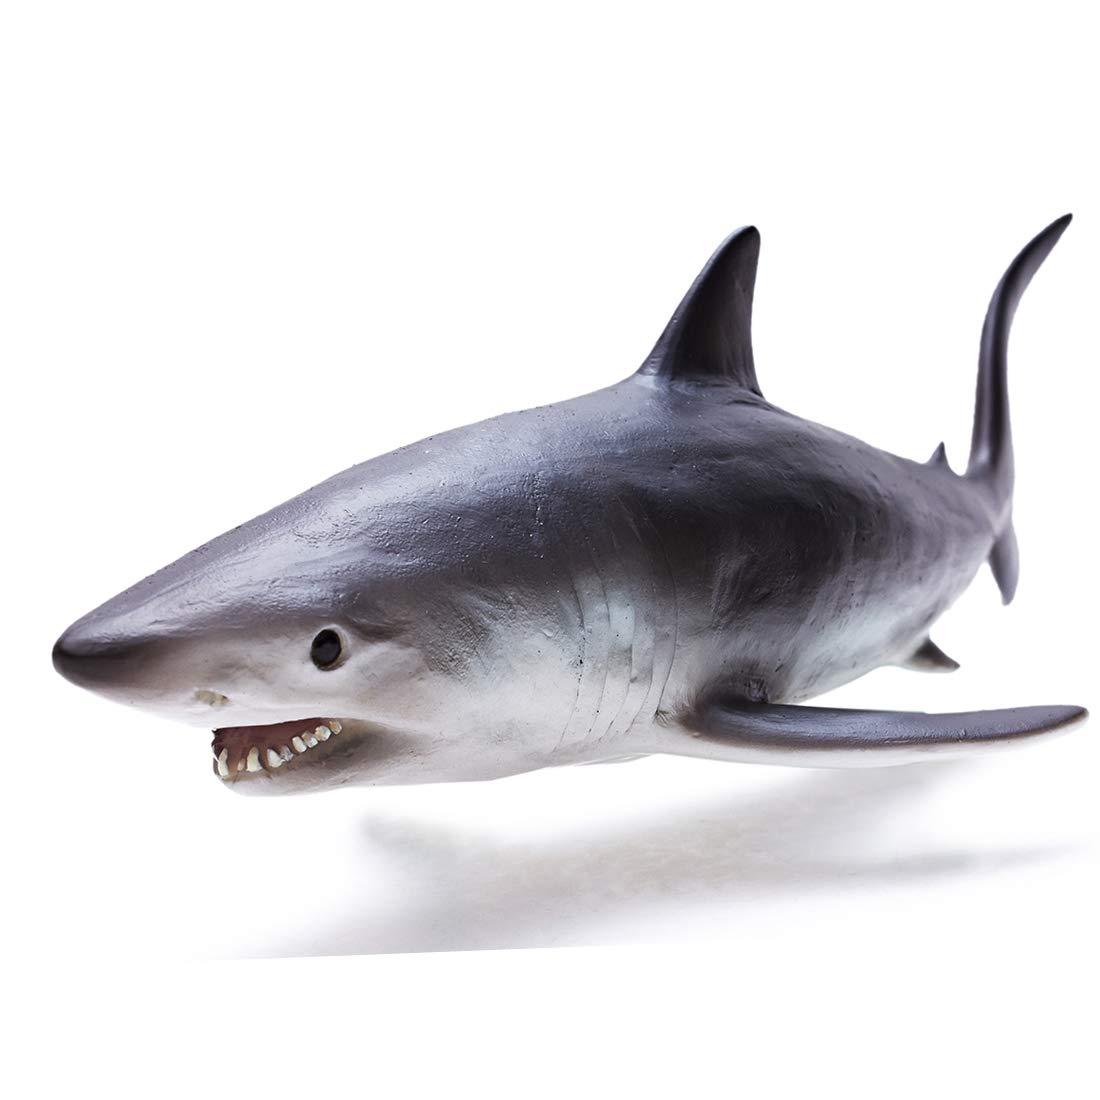 size 40 4cda6 b47f3 RECUR Shortfin Mako Shark Figure Toys, Authentic Shark Figurine  Collection-1:15 Scale Realistic Design Ocean Shark Replica, 10.8inch  Hand-Painted Skin ...